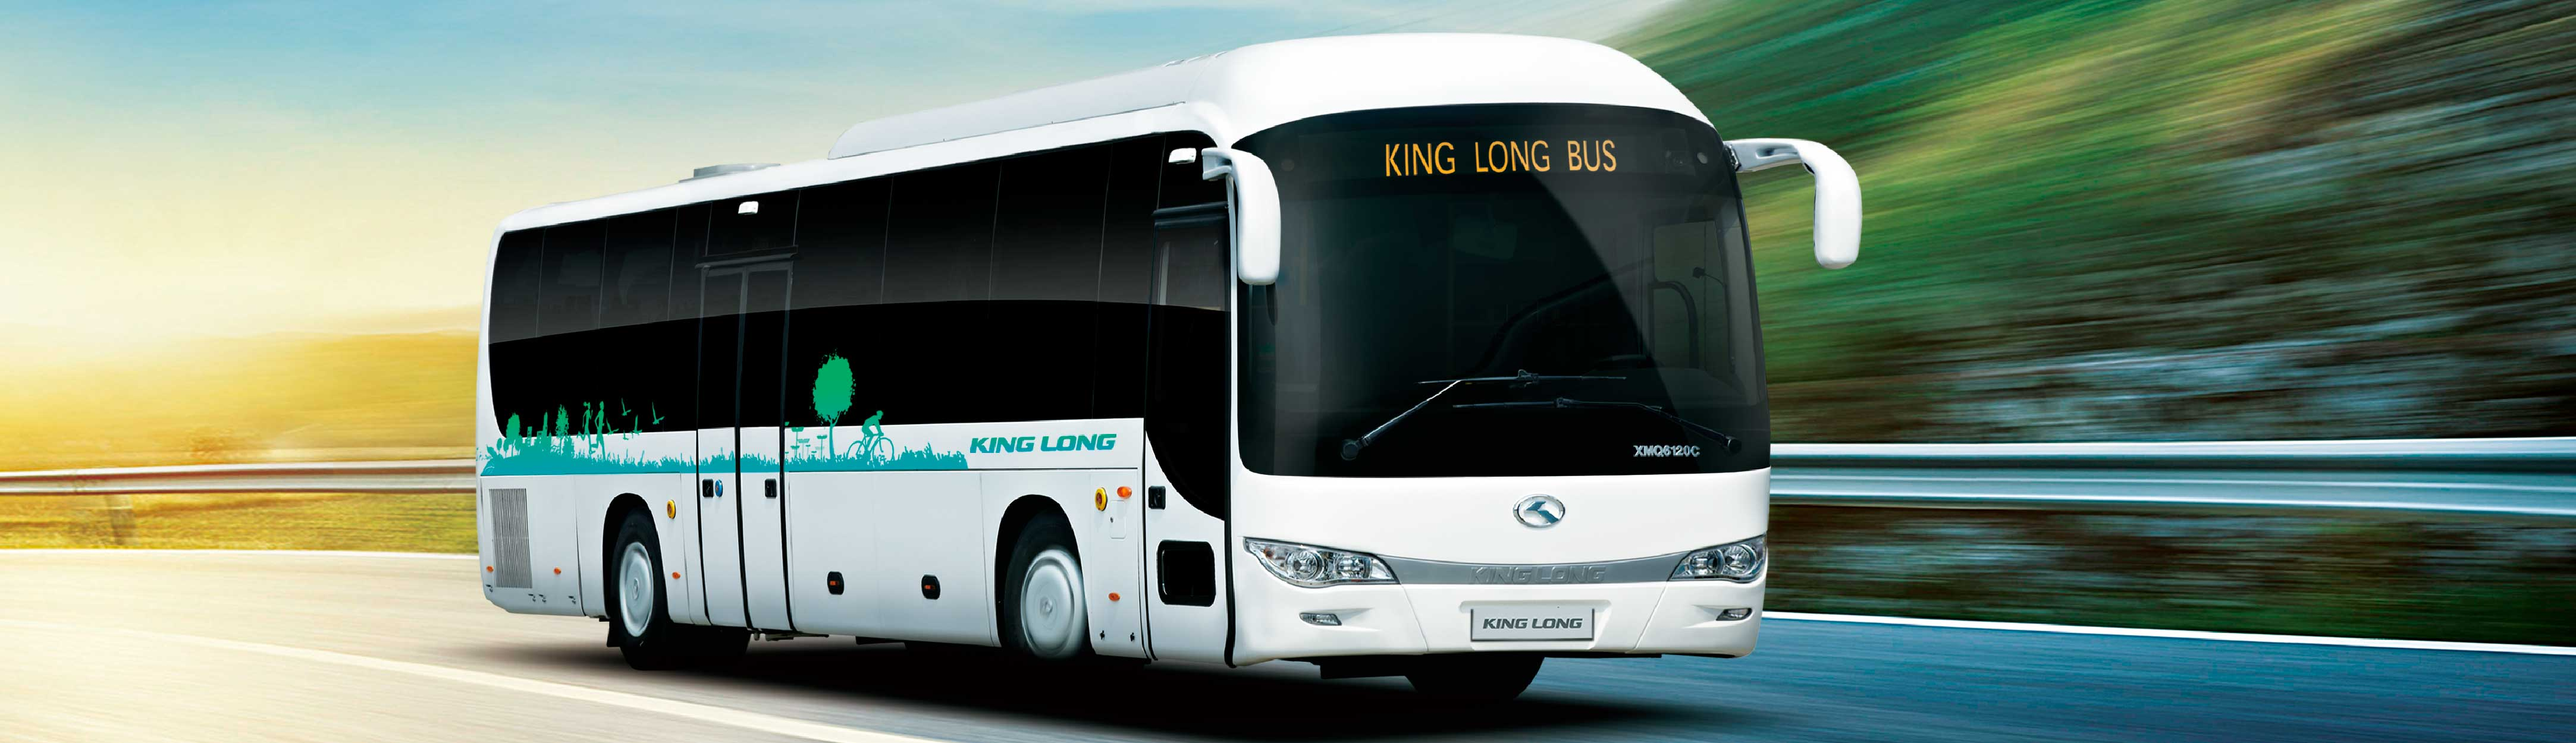 Bus Discreccional Roque Nublo